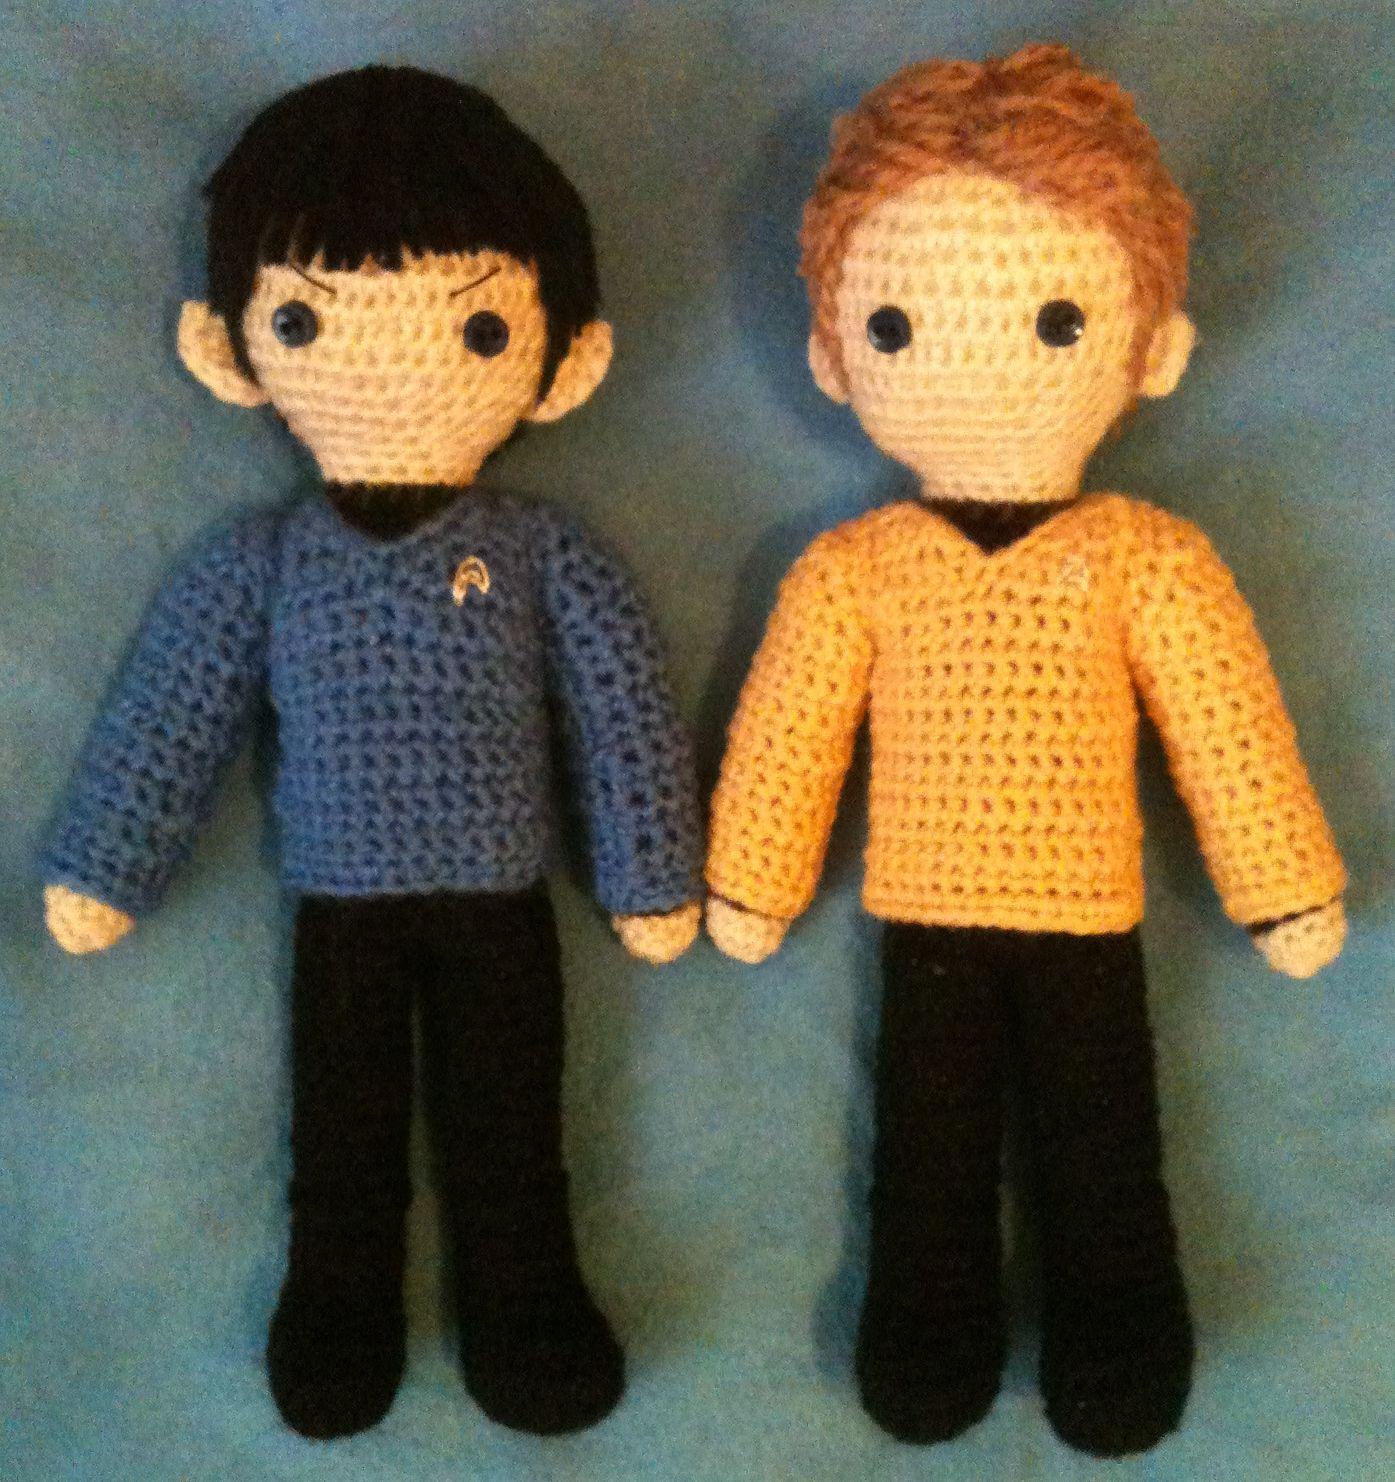 Star Trek amigurumi - Spock and Kirk My Amigurumi Pinterest Spock, Amig...